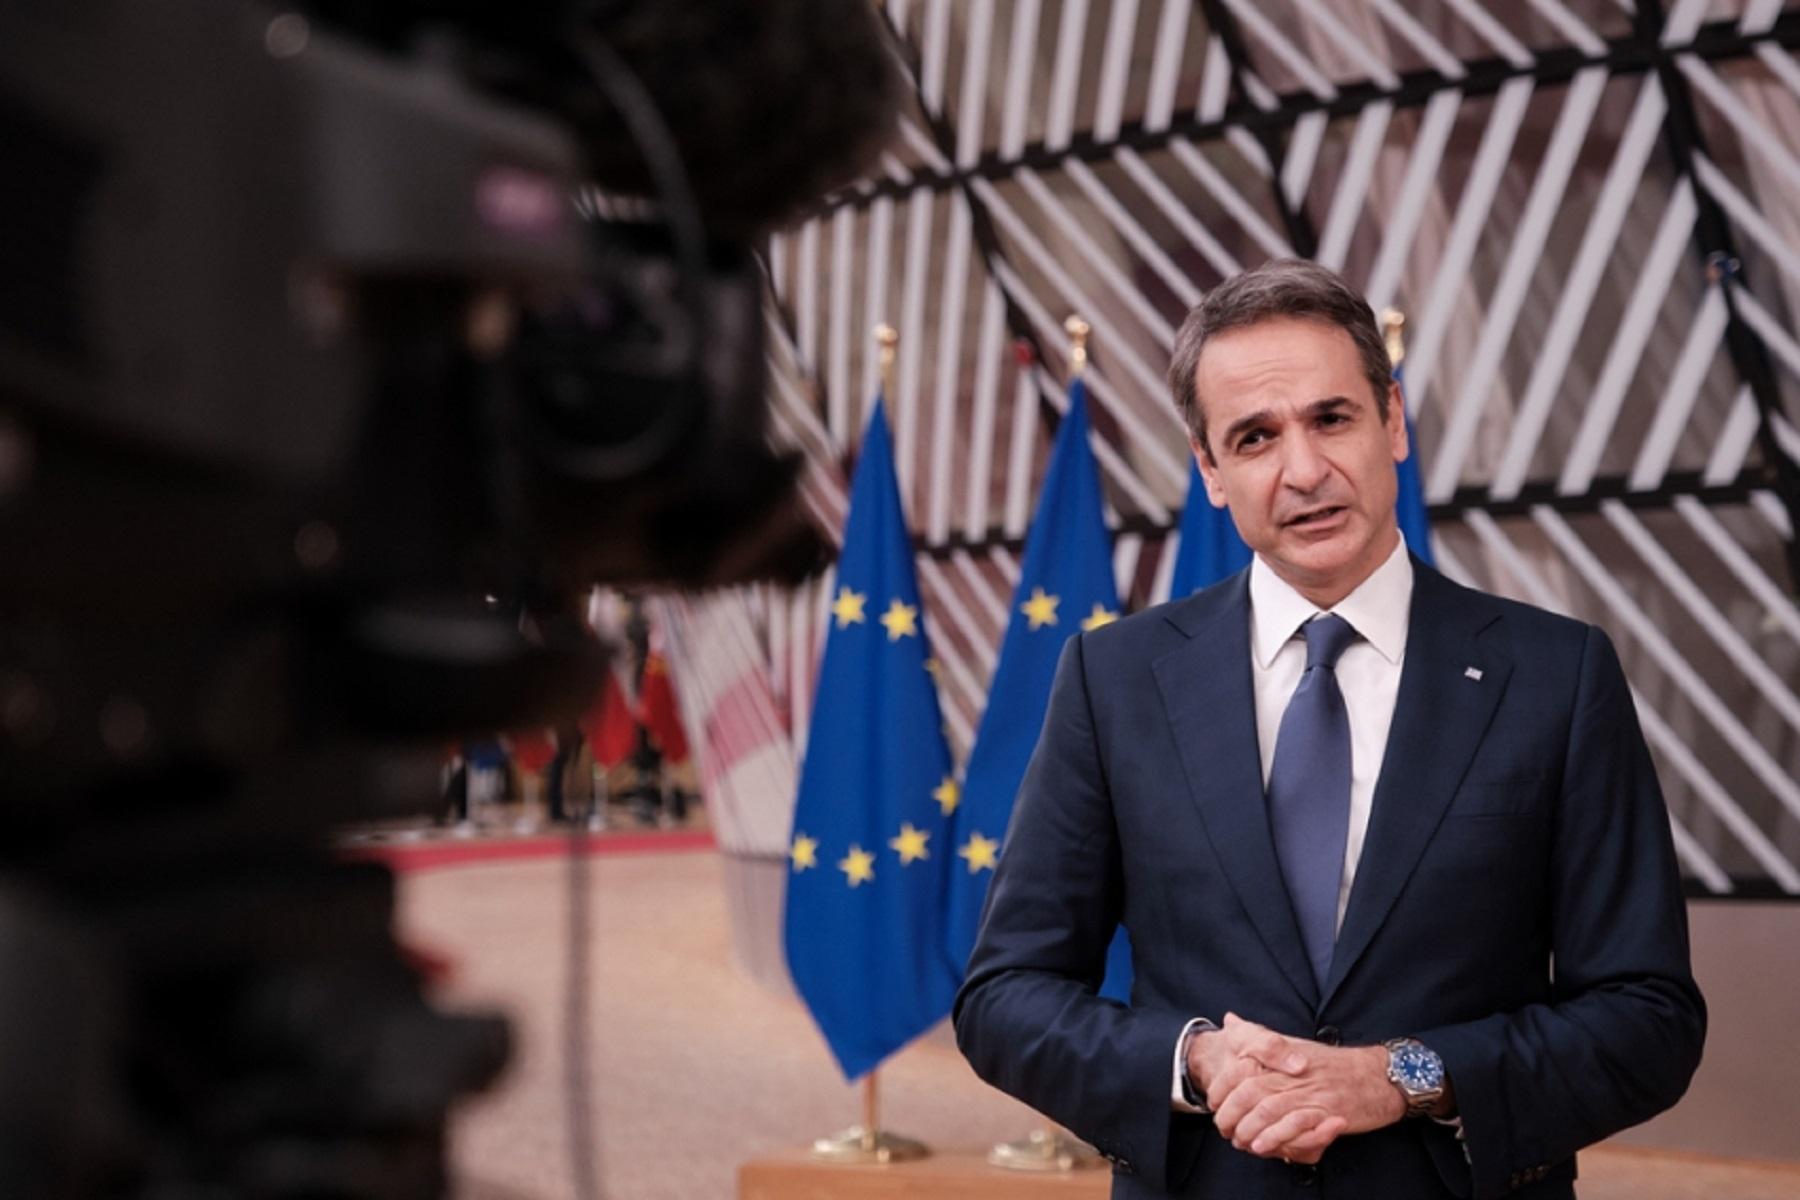 Politico Εμβόλιο: Κοινό πιστοποιητικό εμβολιασμού για την Ε.Ε. προτείνει ο Πρωθυπουργός